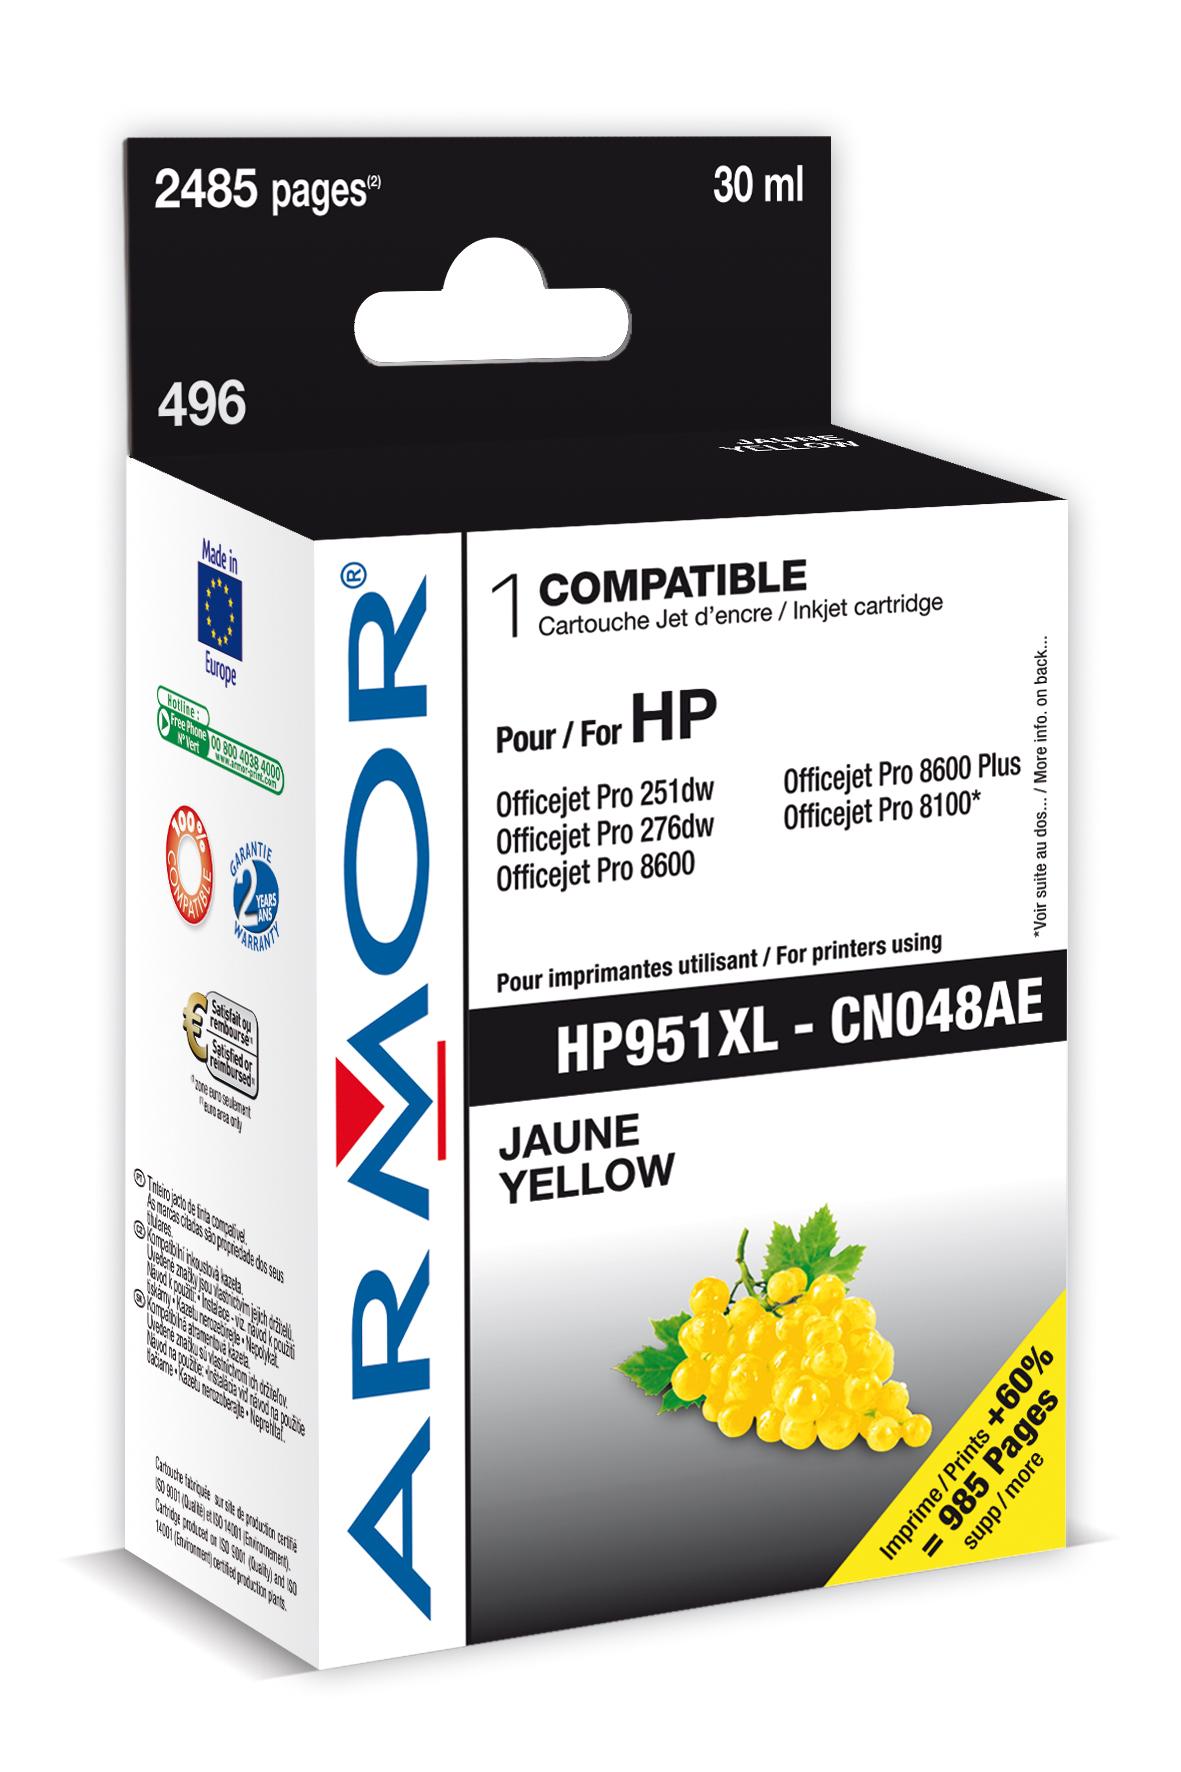 Armor ink-jet pro HP OJ 8100/8600 yellow, 30ml